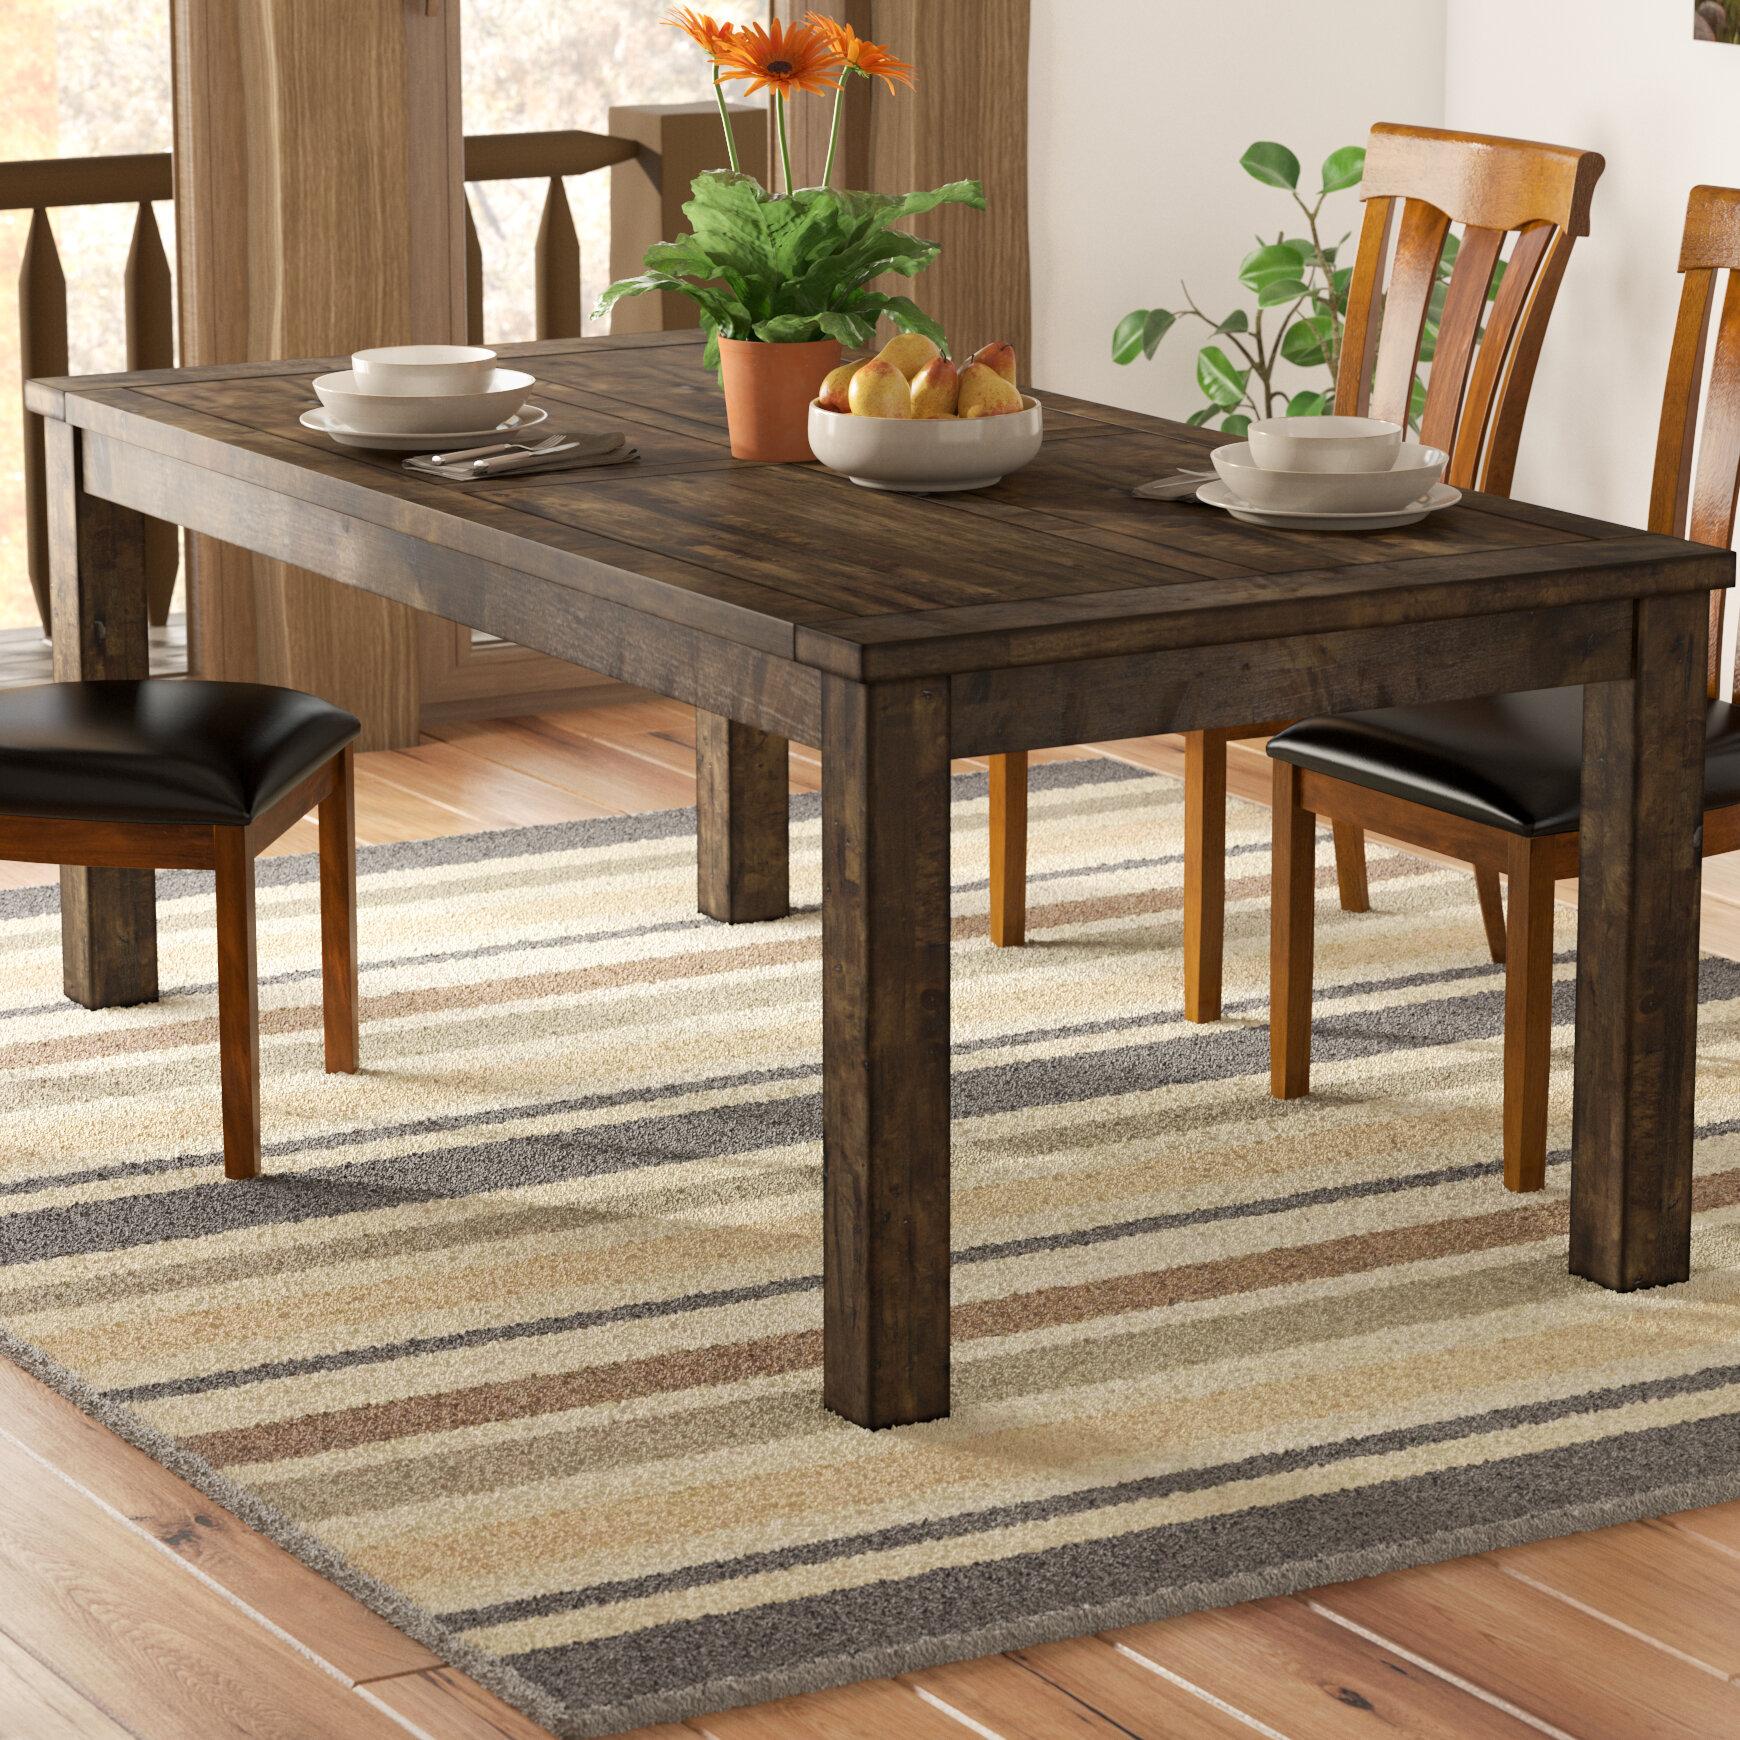 Mistana america dining table reviews wayfair